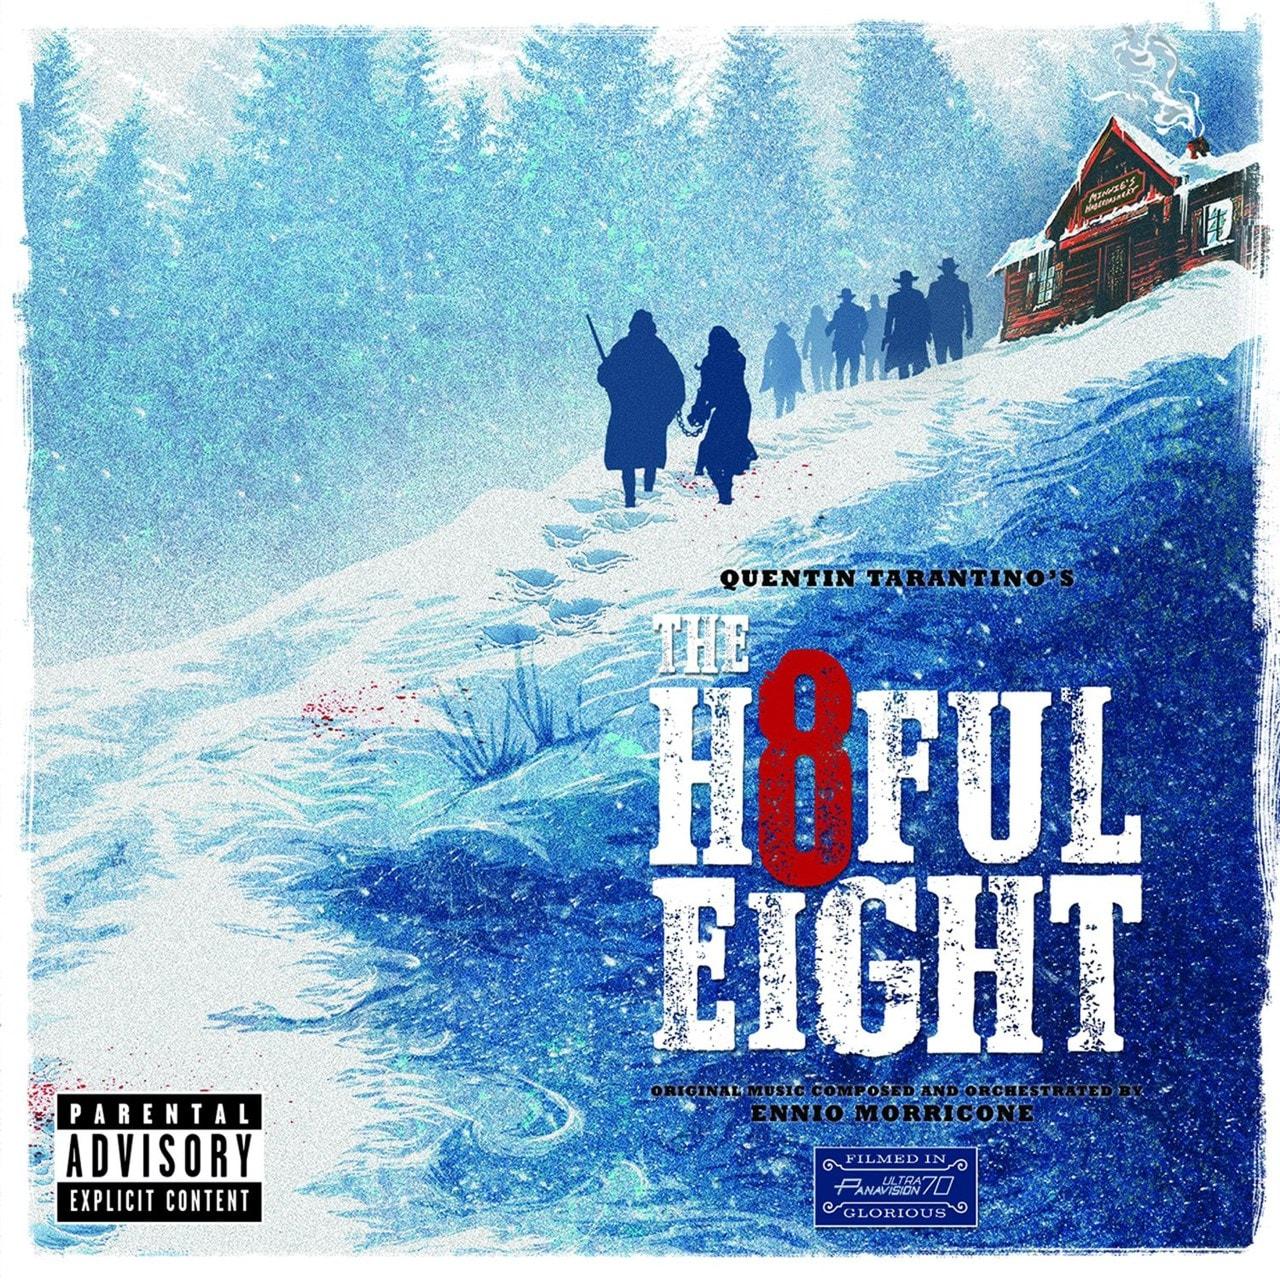 Quentin Tarantino's the Hateful Eight - 1